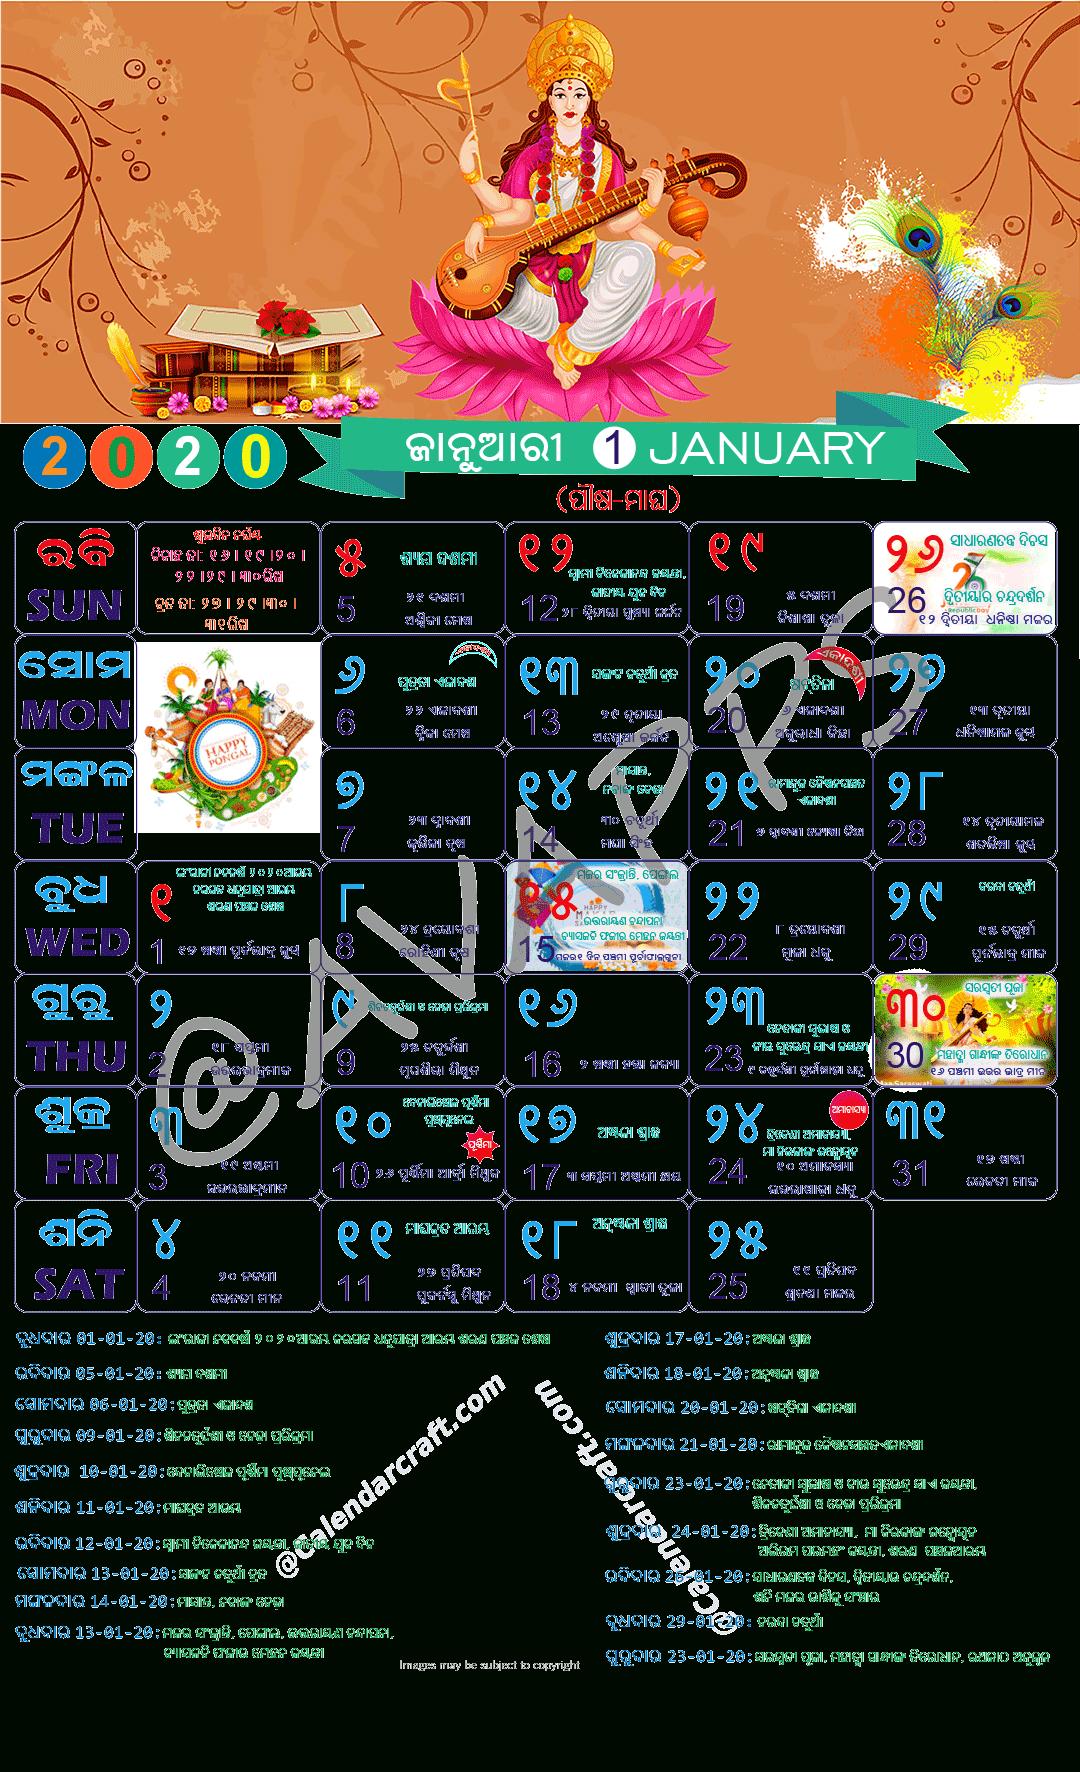 Odia Calendar 2020 Kohinoor Pdf | Seg throughout Bihar Govt Calendar 2020 Pdf